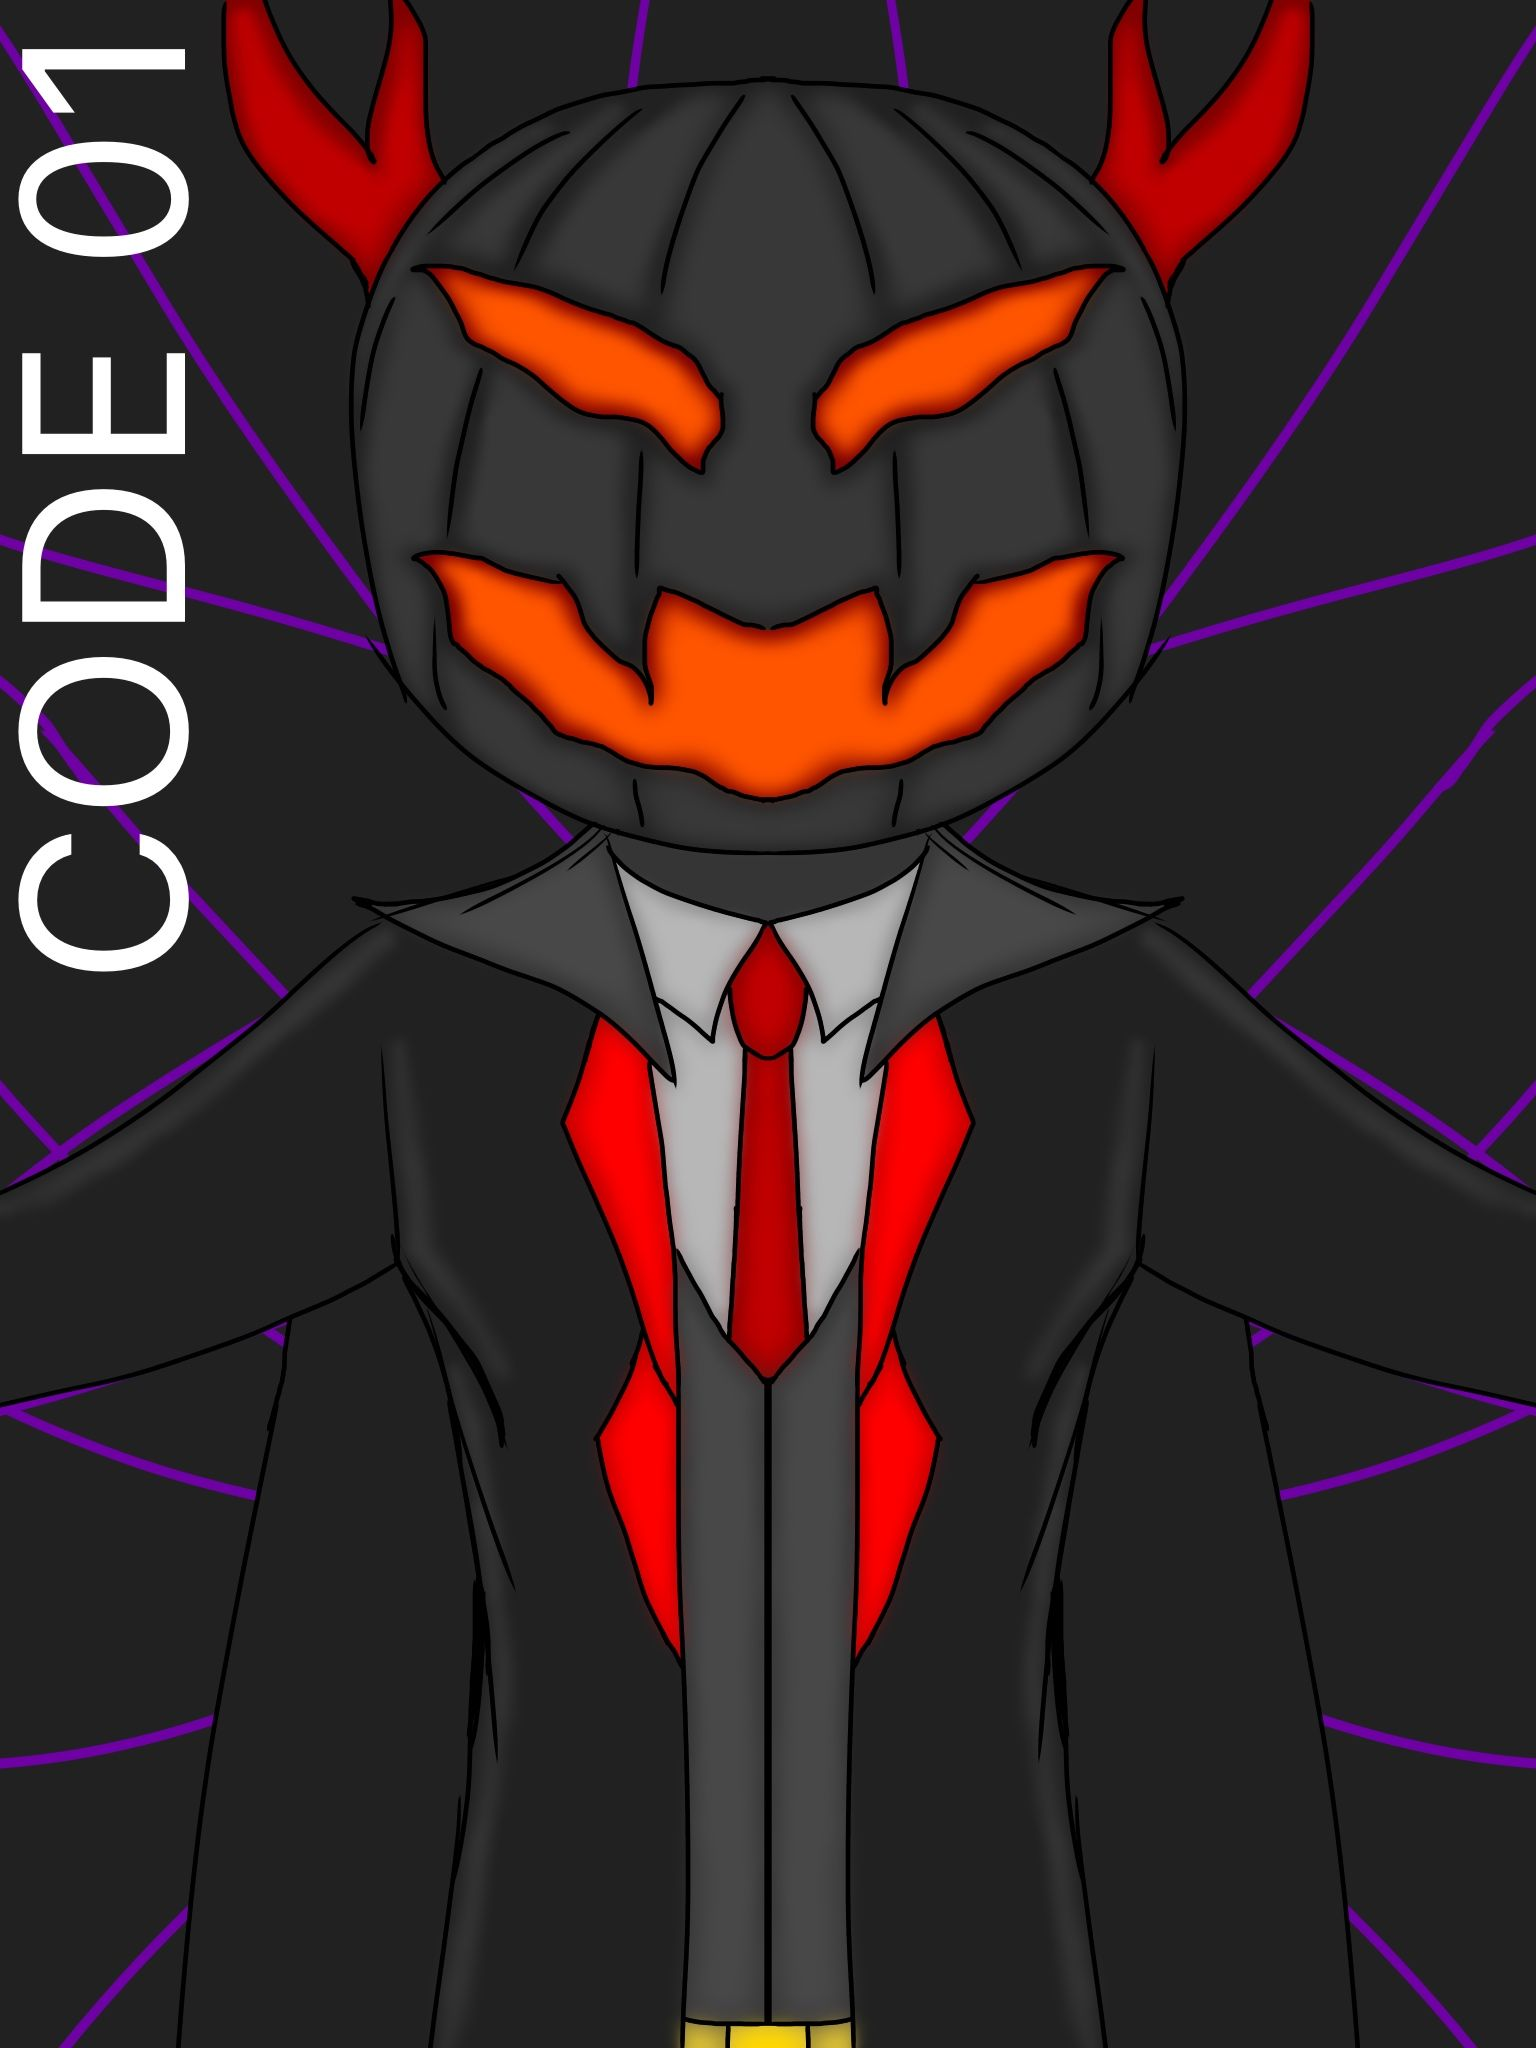 Roblox Art Code 01 - it aint me code roblox